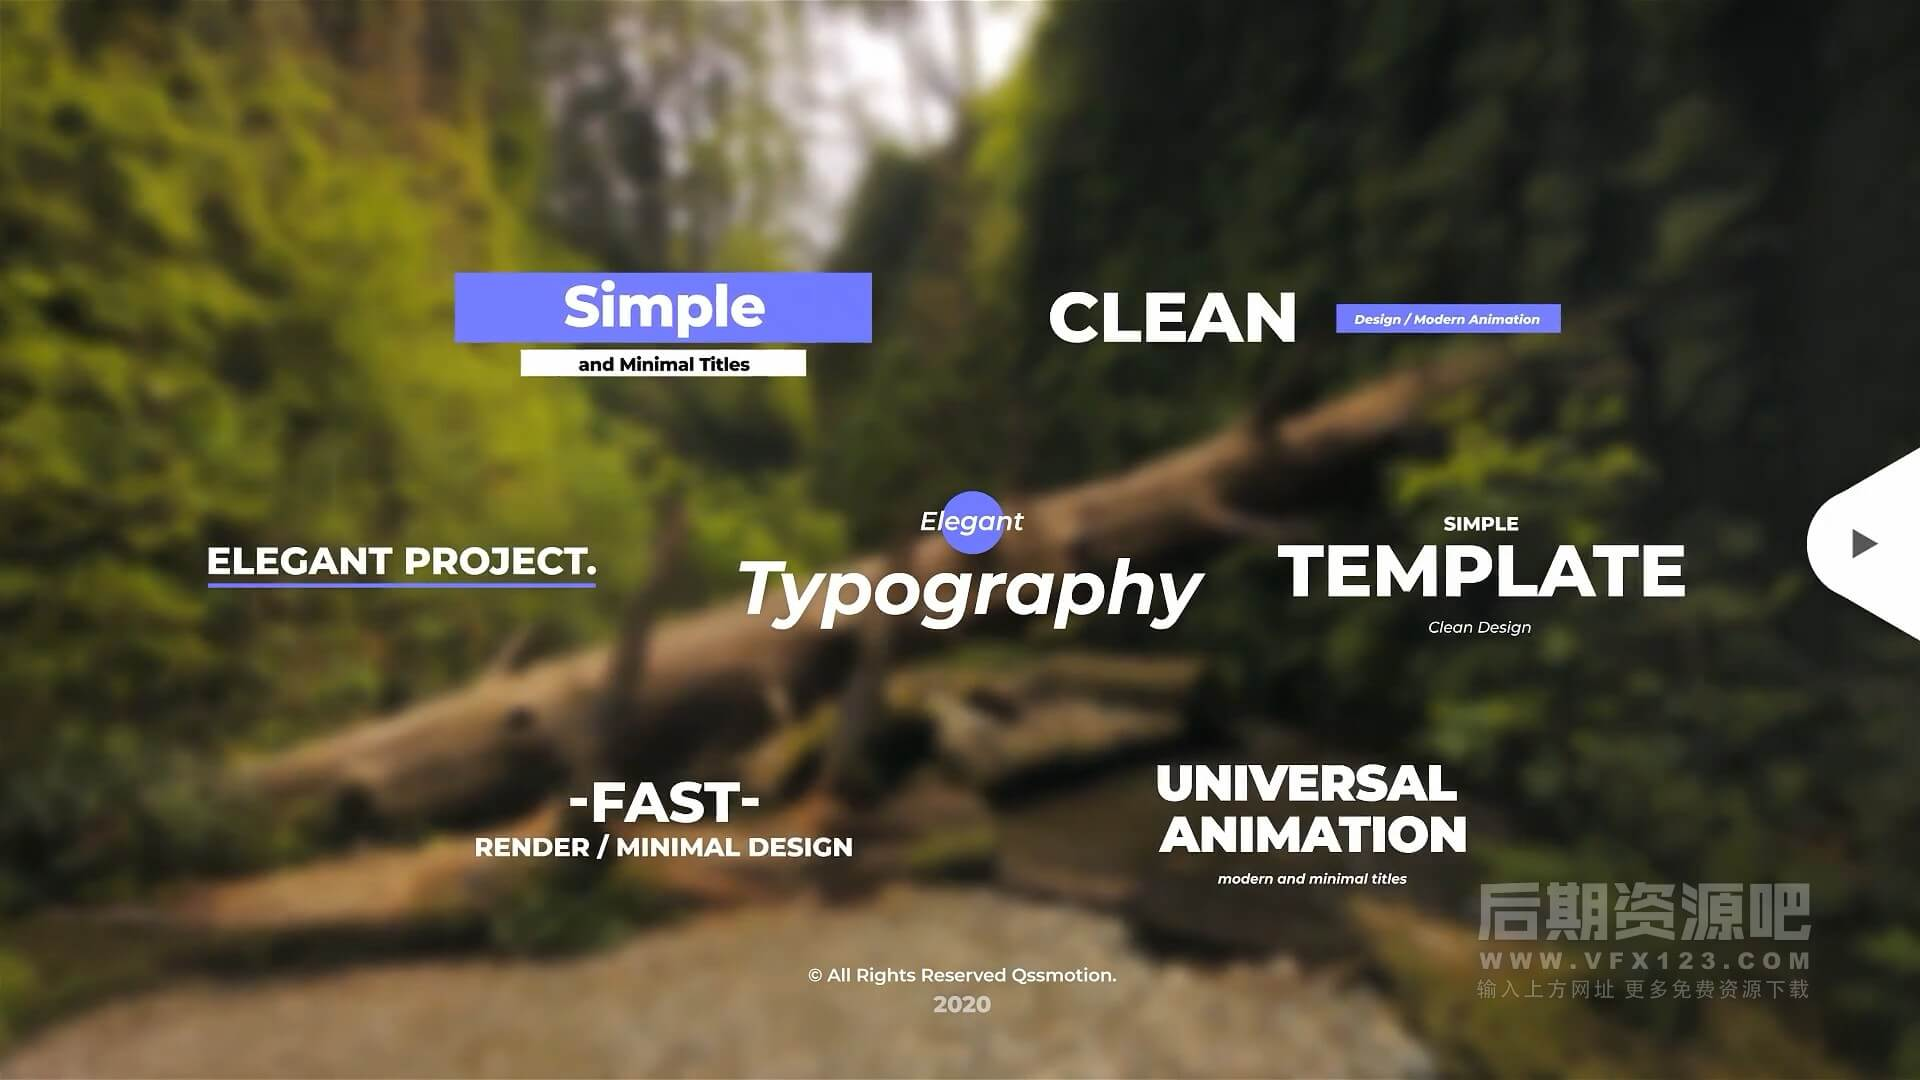 fcpx插件 简洁时尚文字标题动画字幕条模板 Simple And Minimal Titles